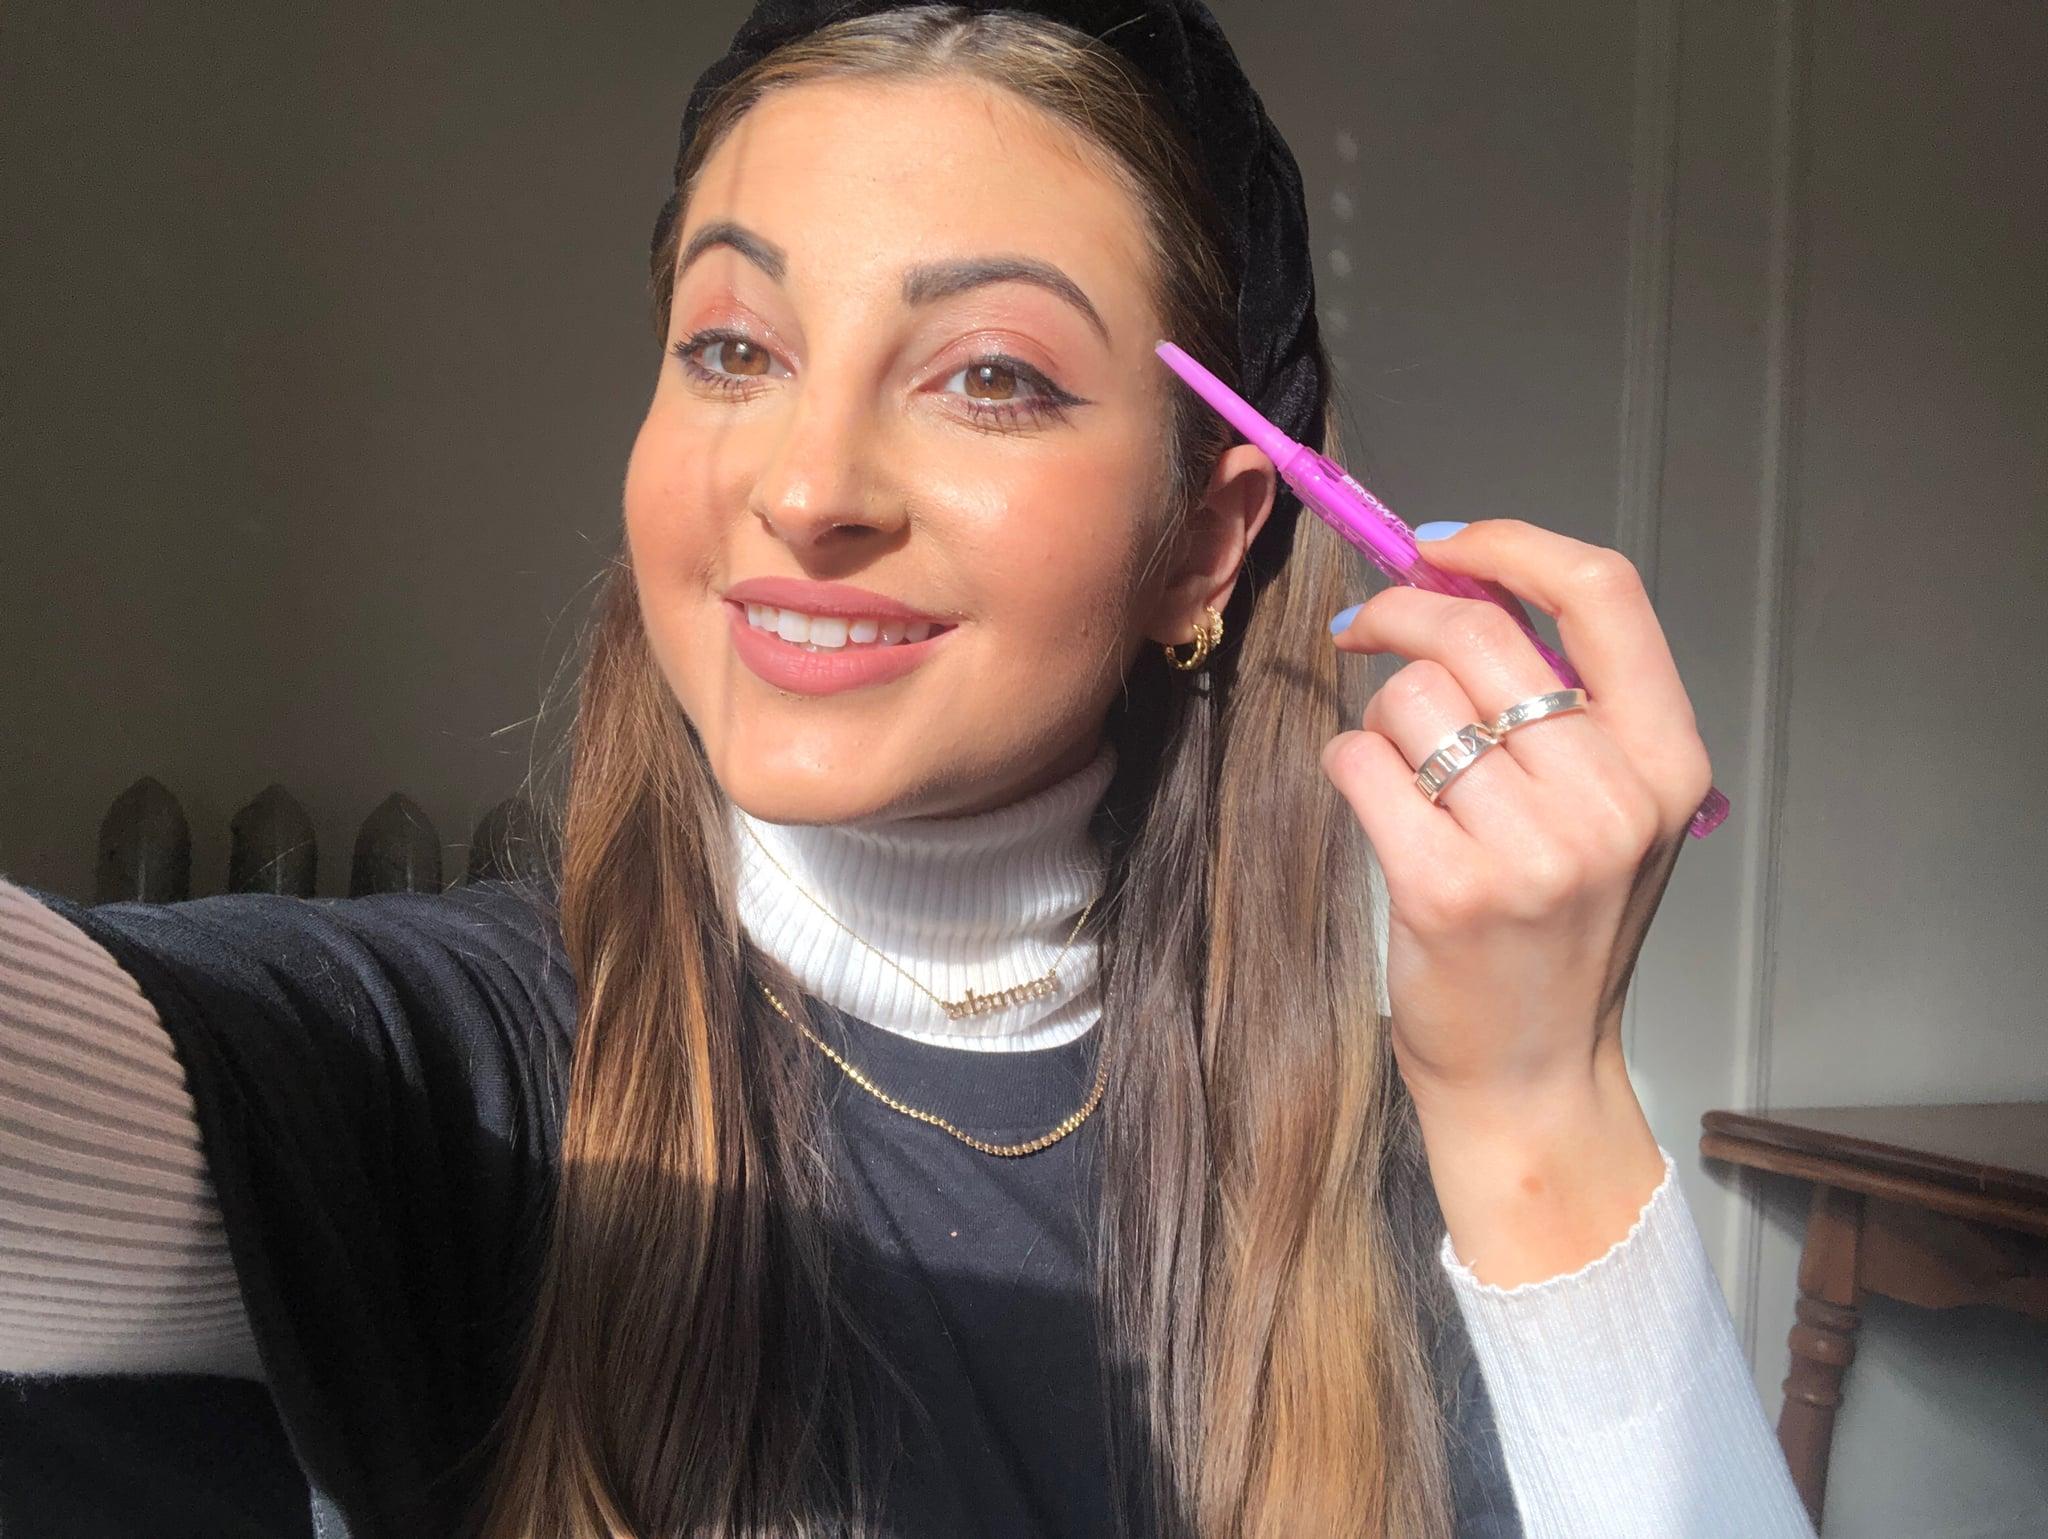 Kosas Brow Pop Defining Eyebrow Pencil Review 3